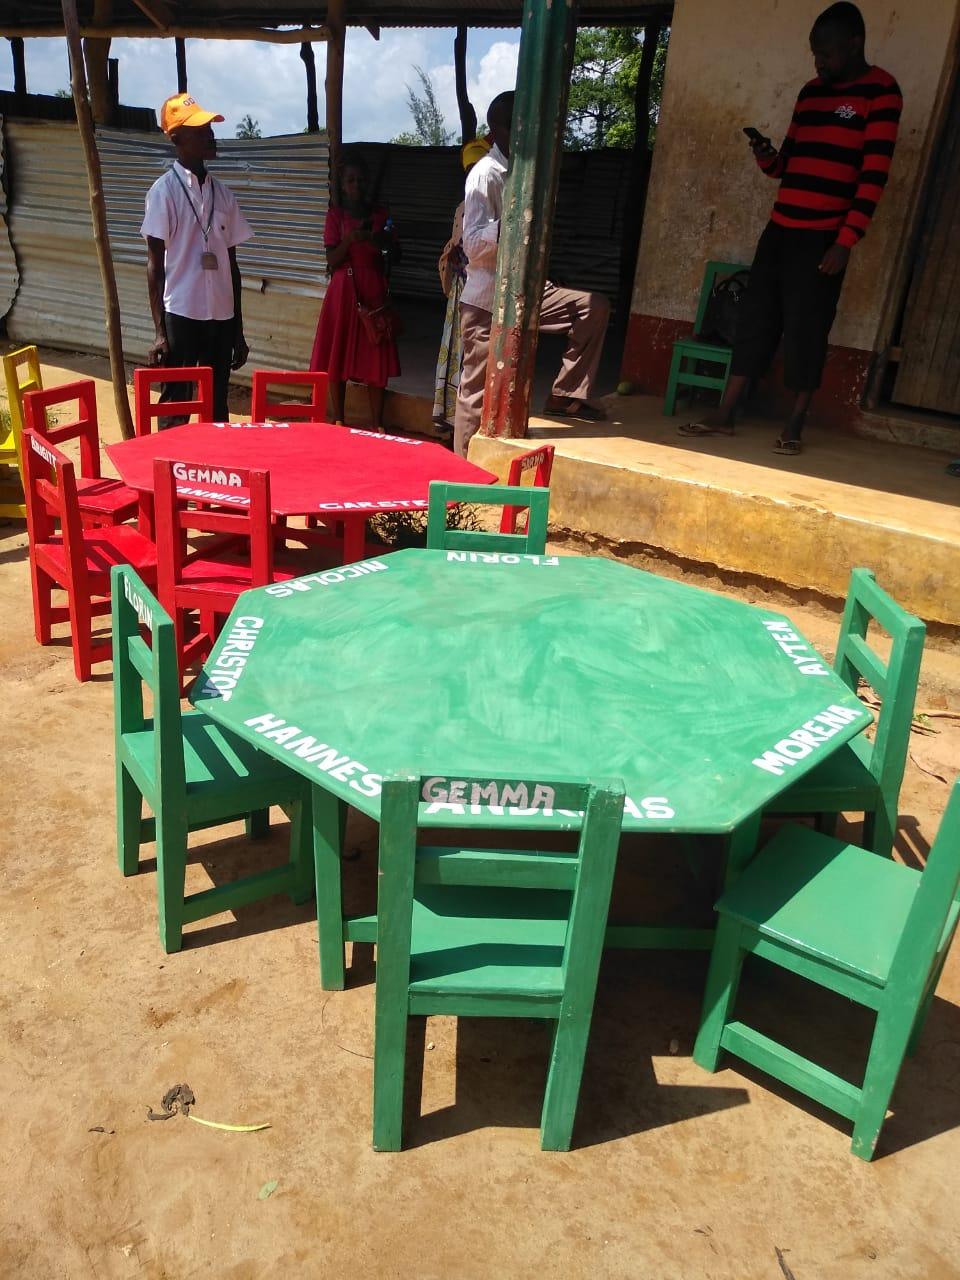 Schulinventar - handmade made in Africa